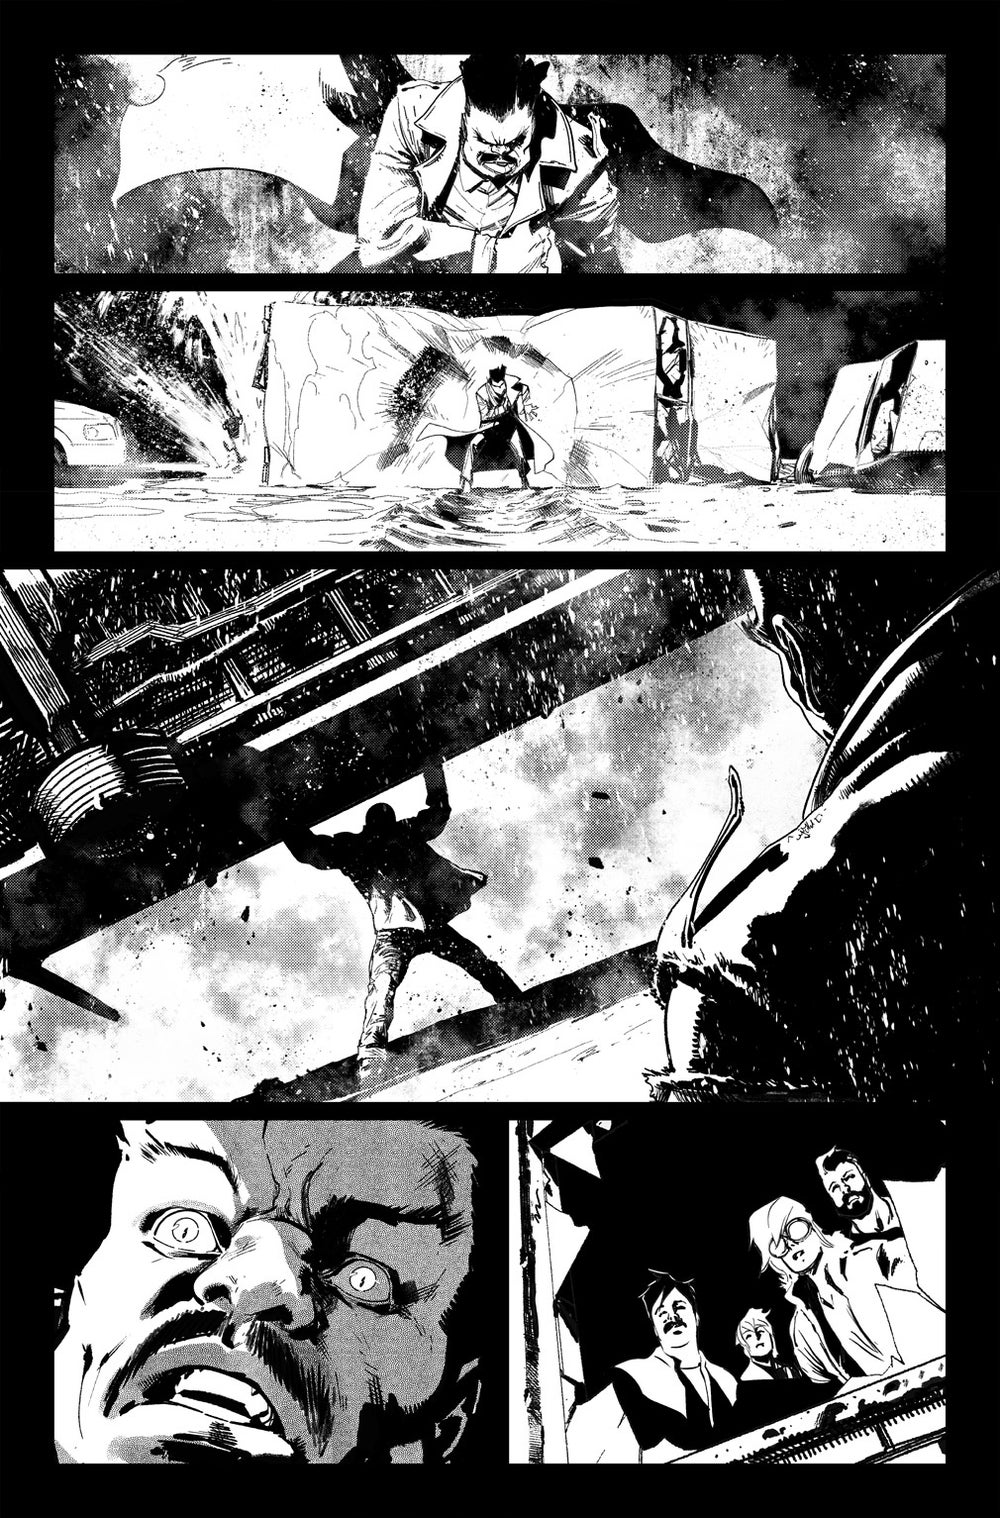 Image of DEFENDERS #9, p.13 ARTIST'S PROOF